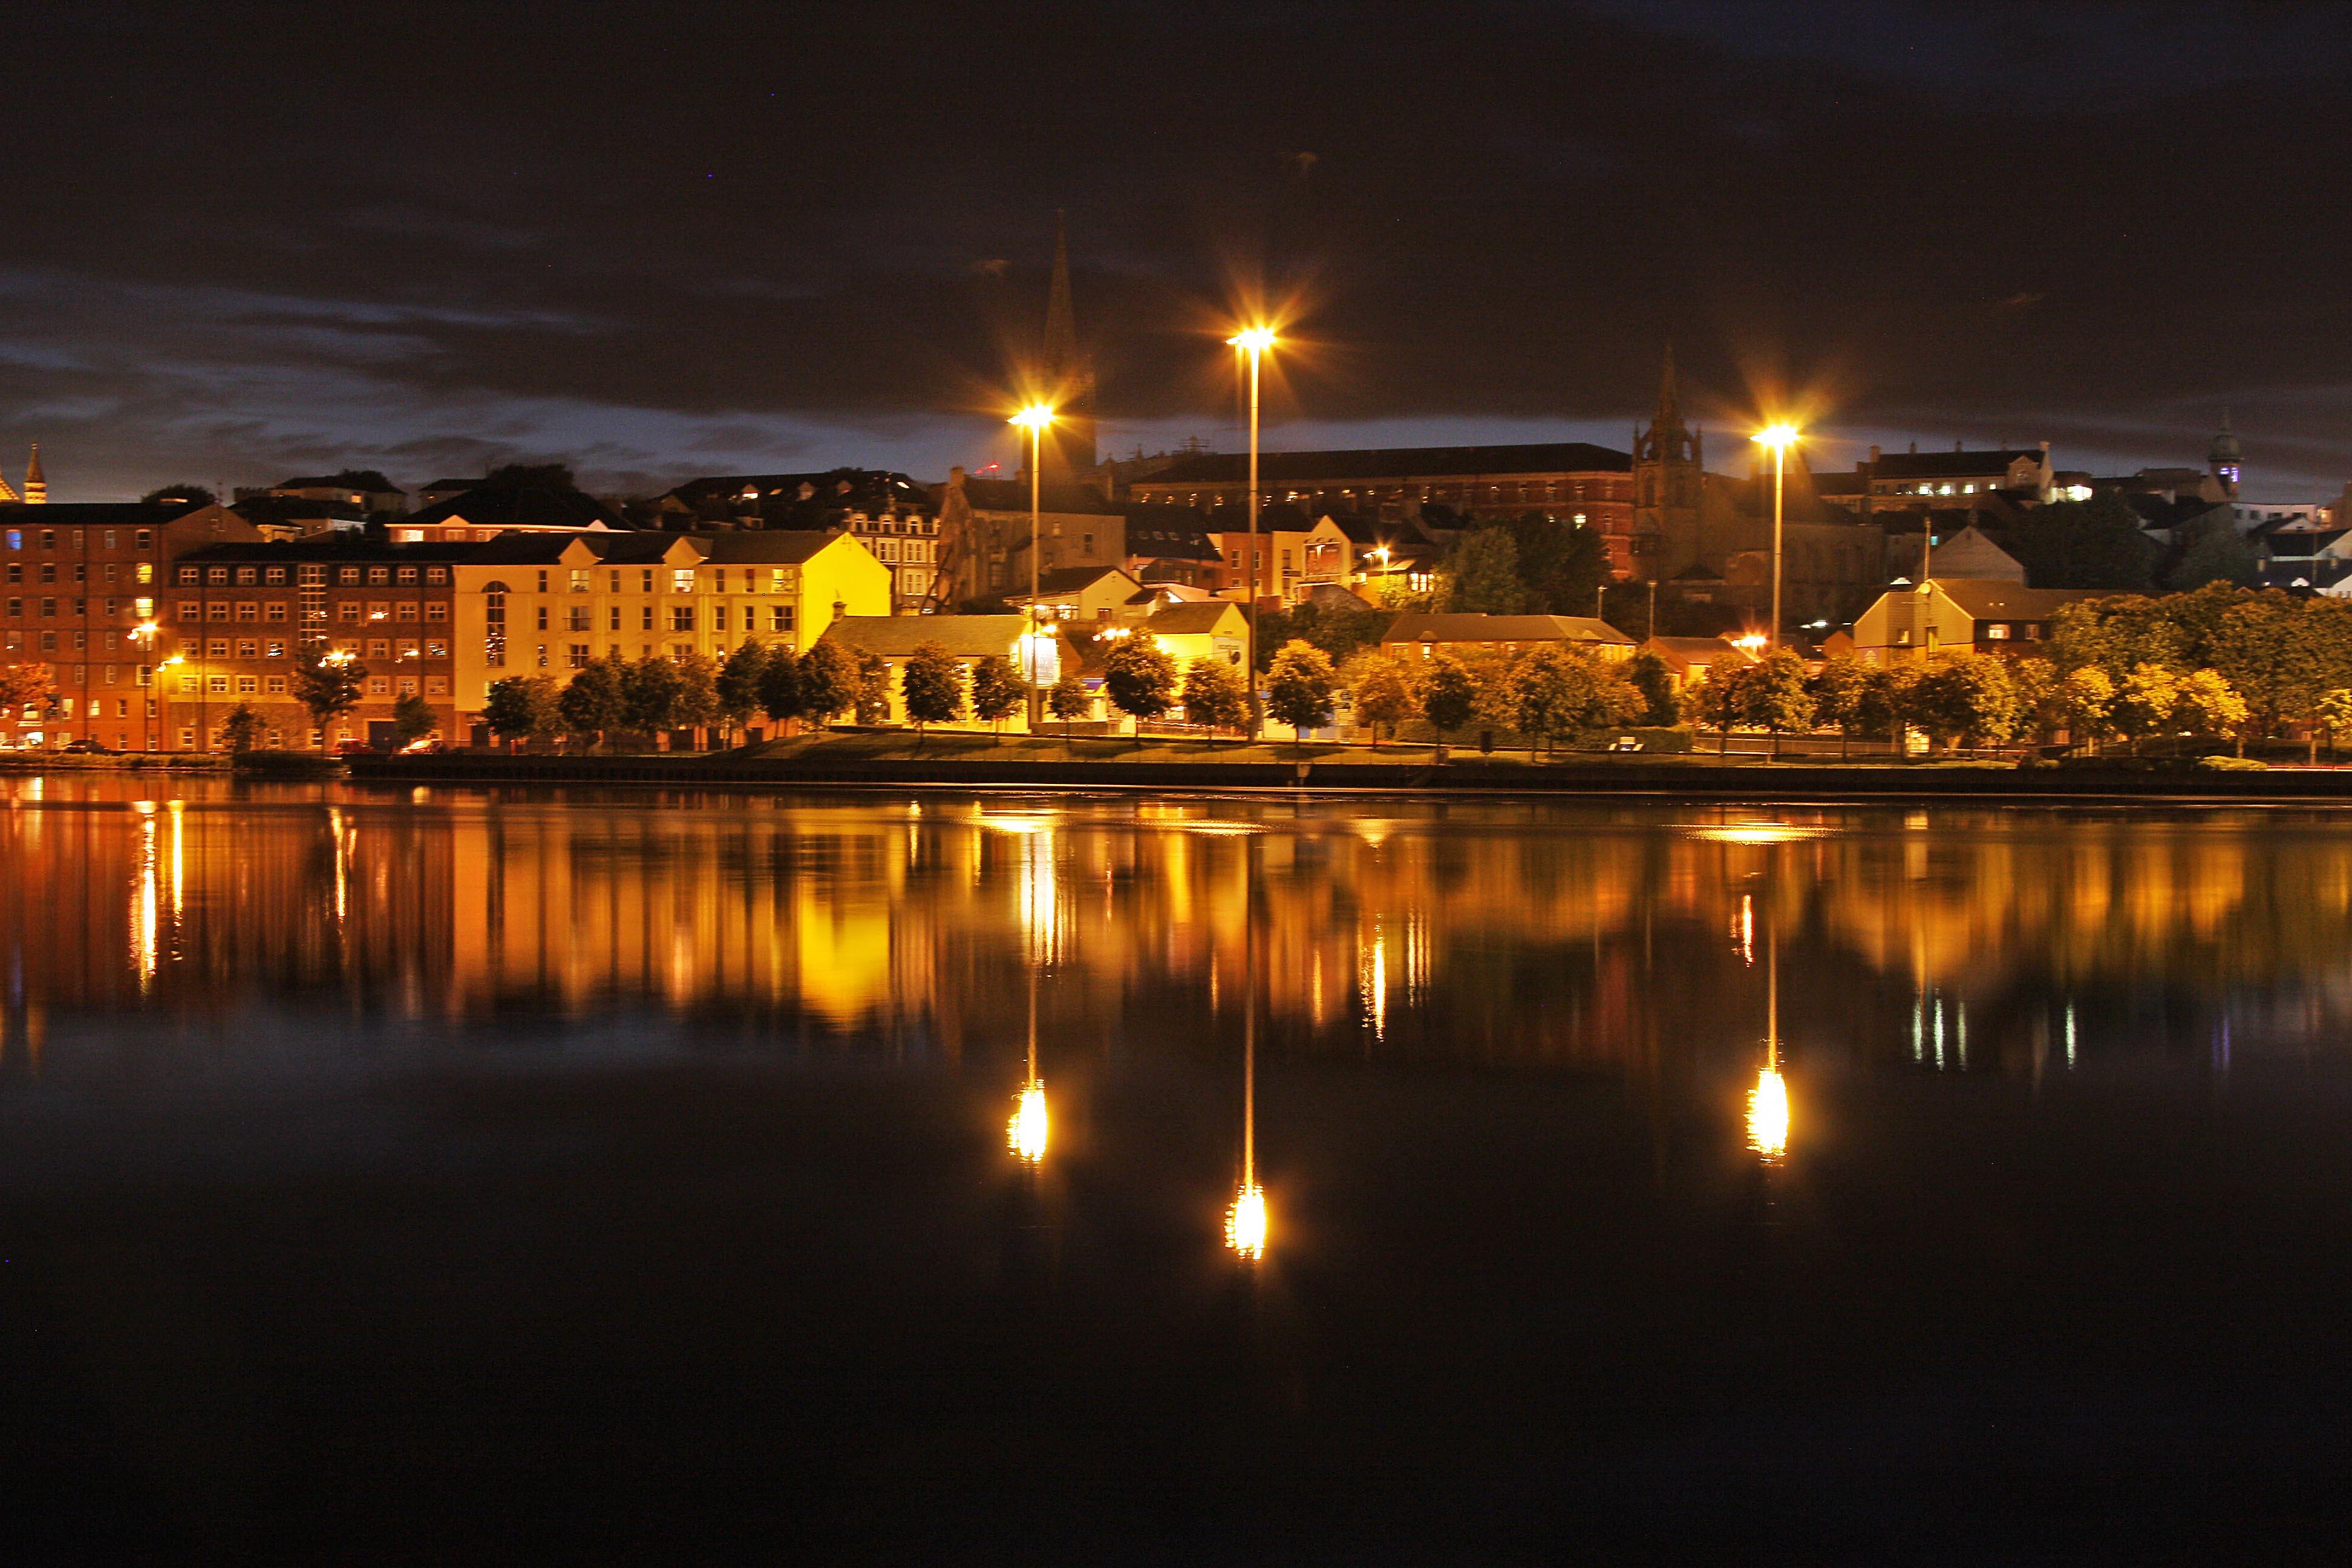 River Foyle, Derry, N Ireland.